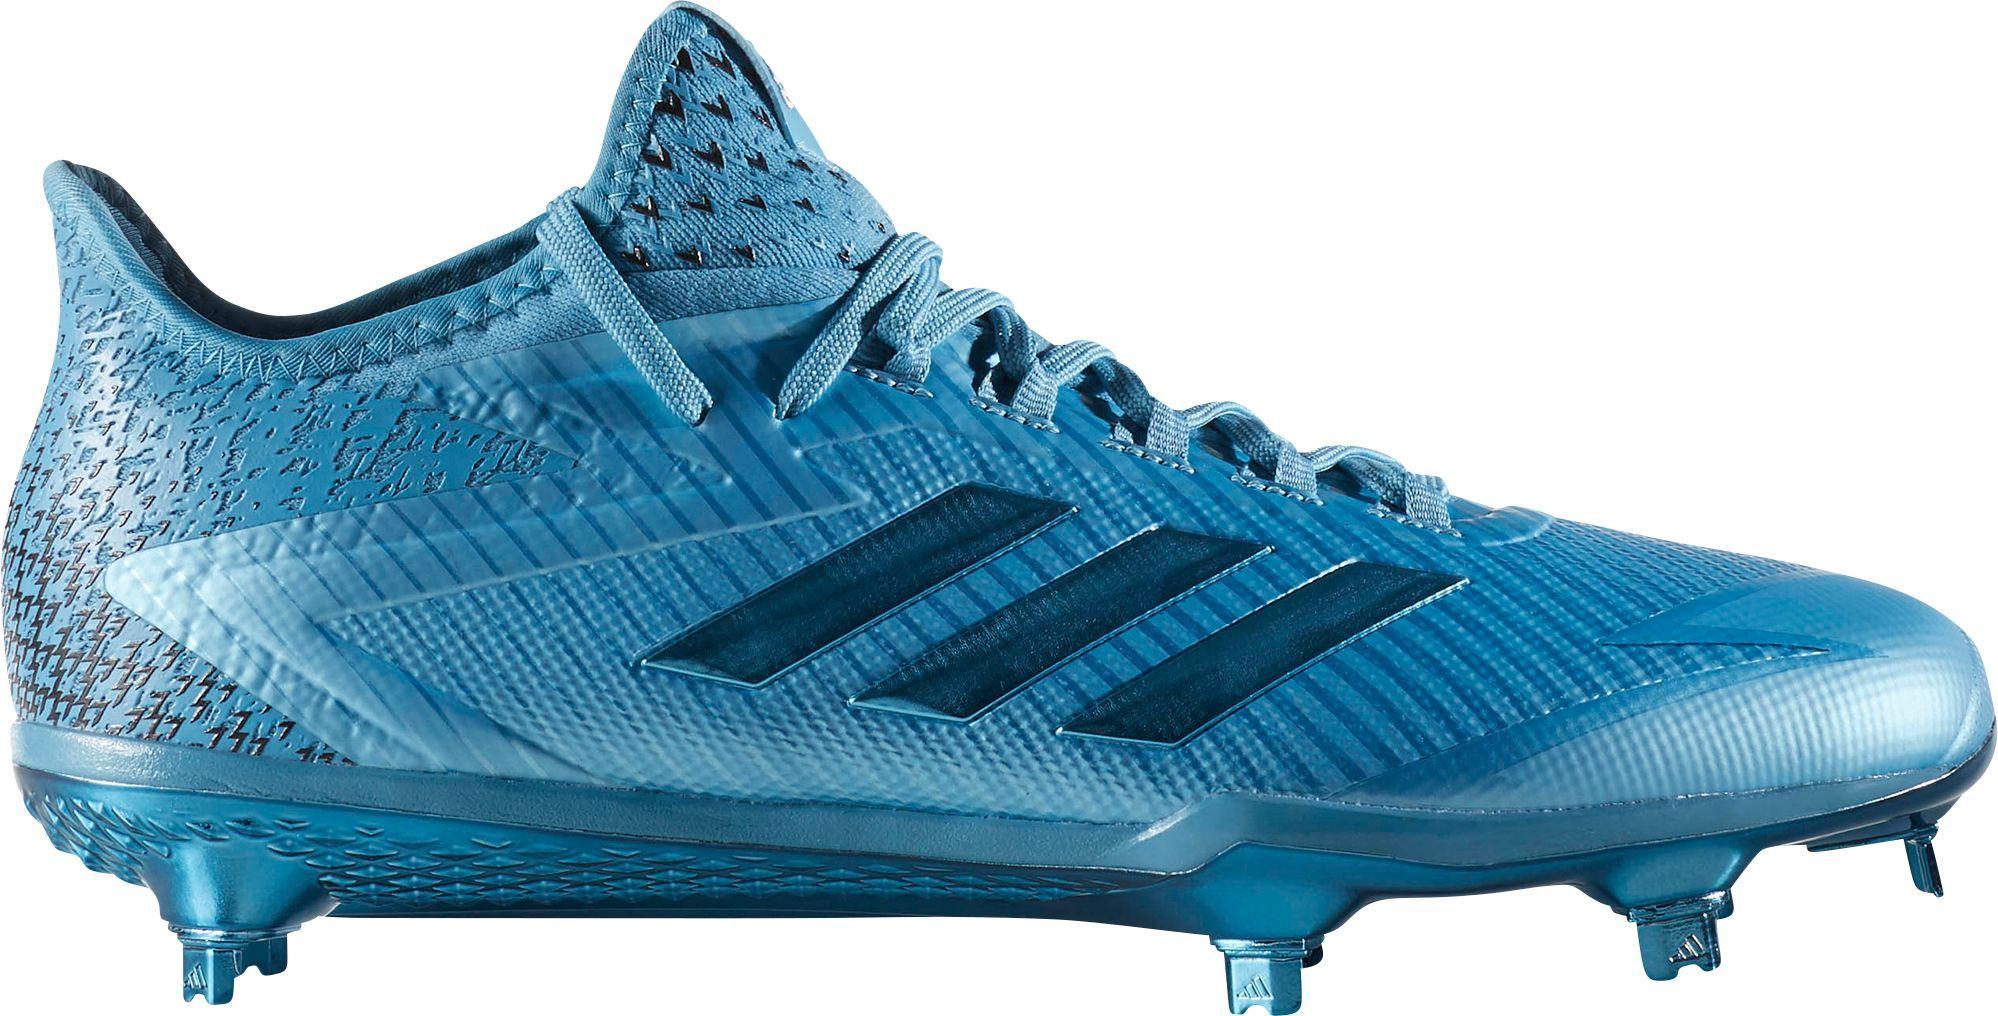 low priced 9672a fc26c adidas Mens adizero AfterBurner 4 Dip Baseball Cleats, Size 13.0, Blue